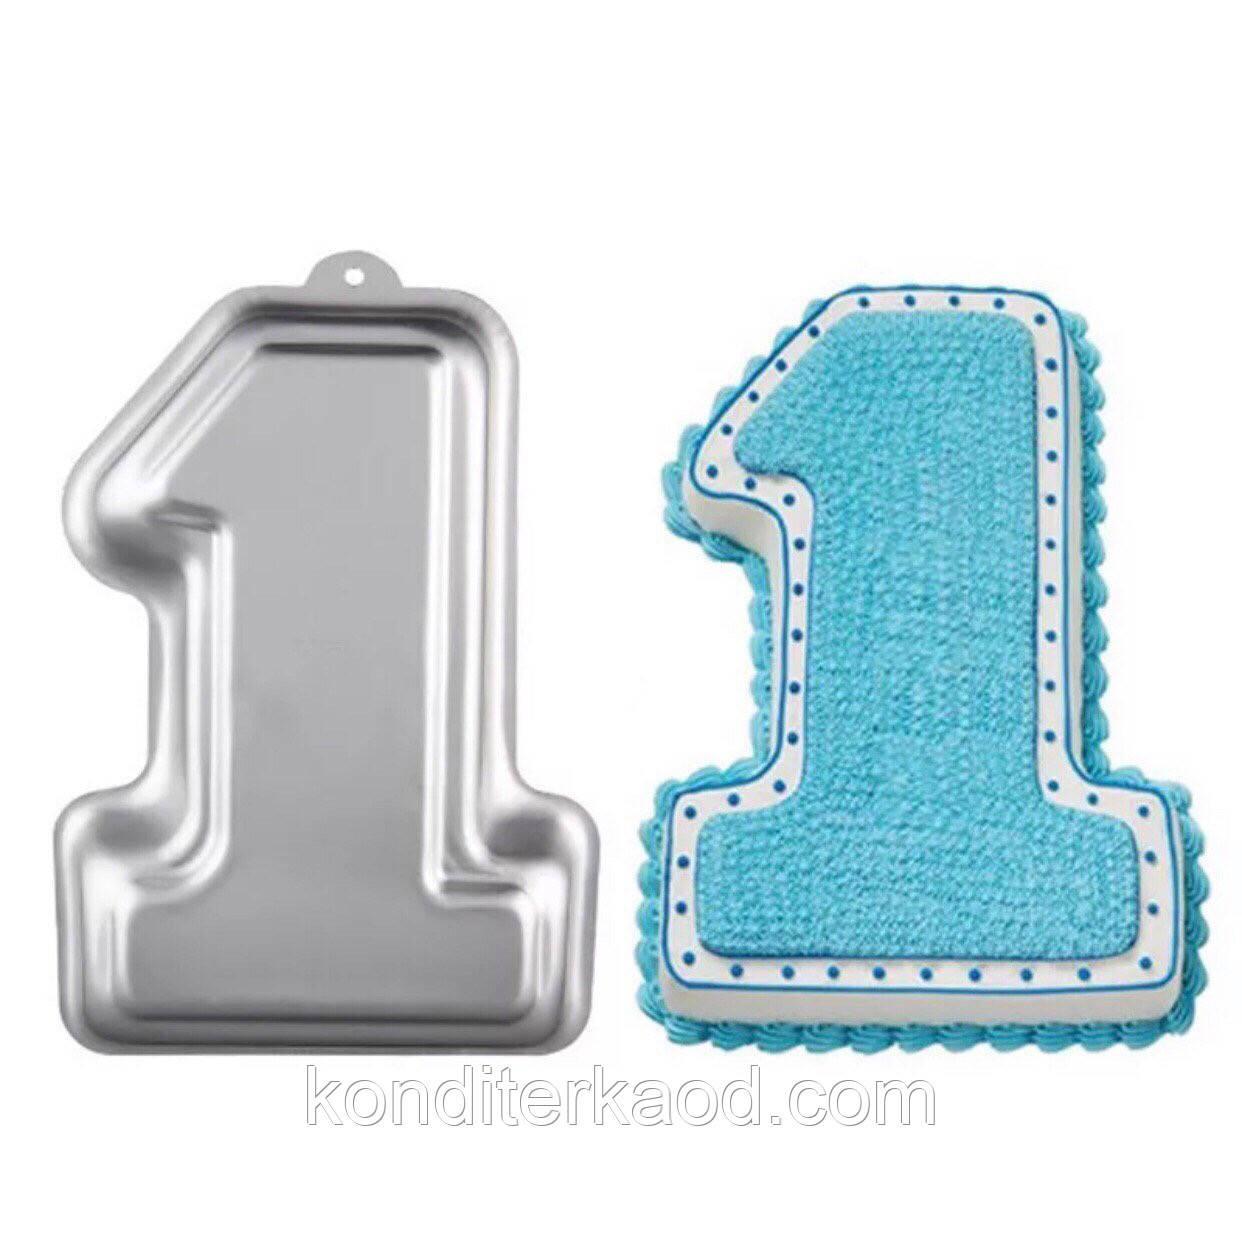 Форма для выпечки Цифра 1 (метал)